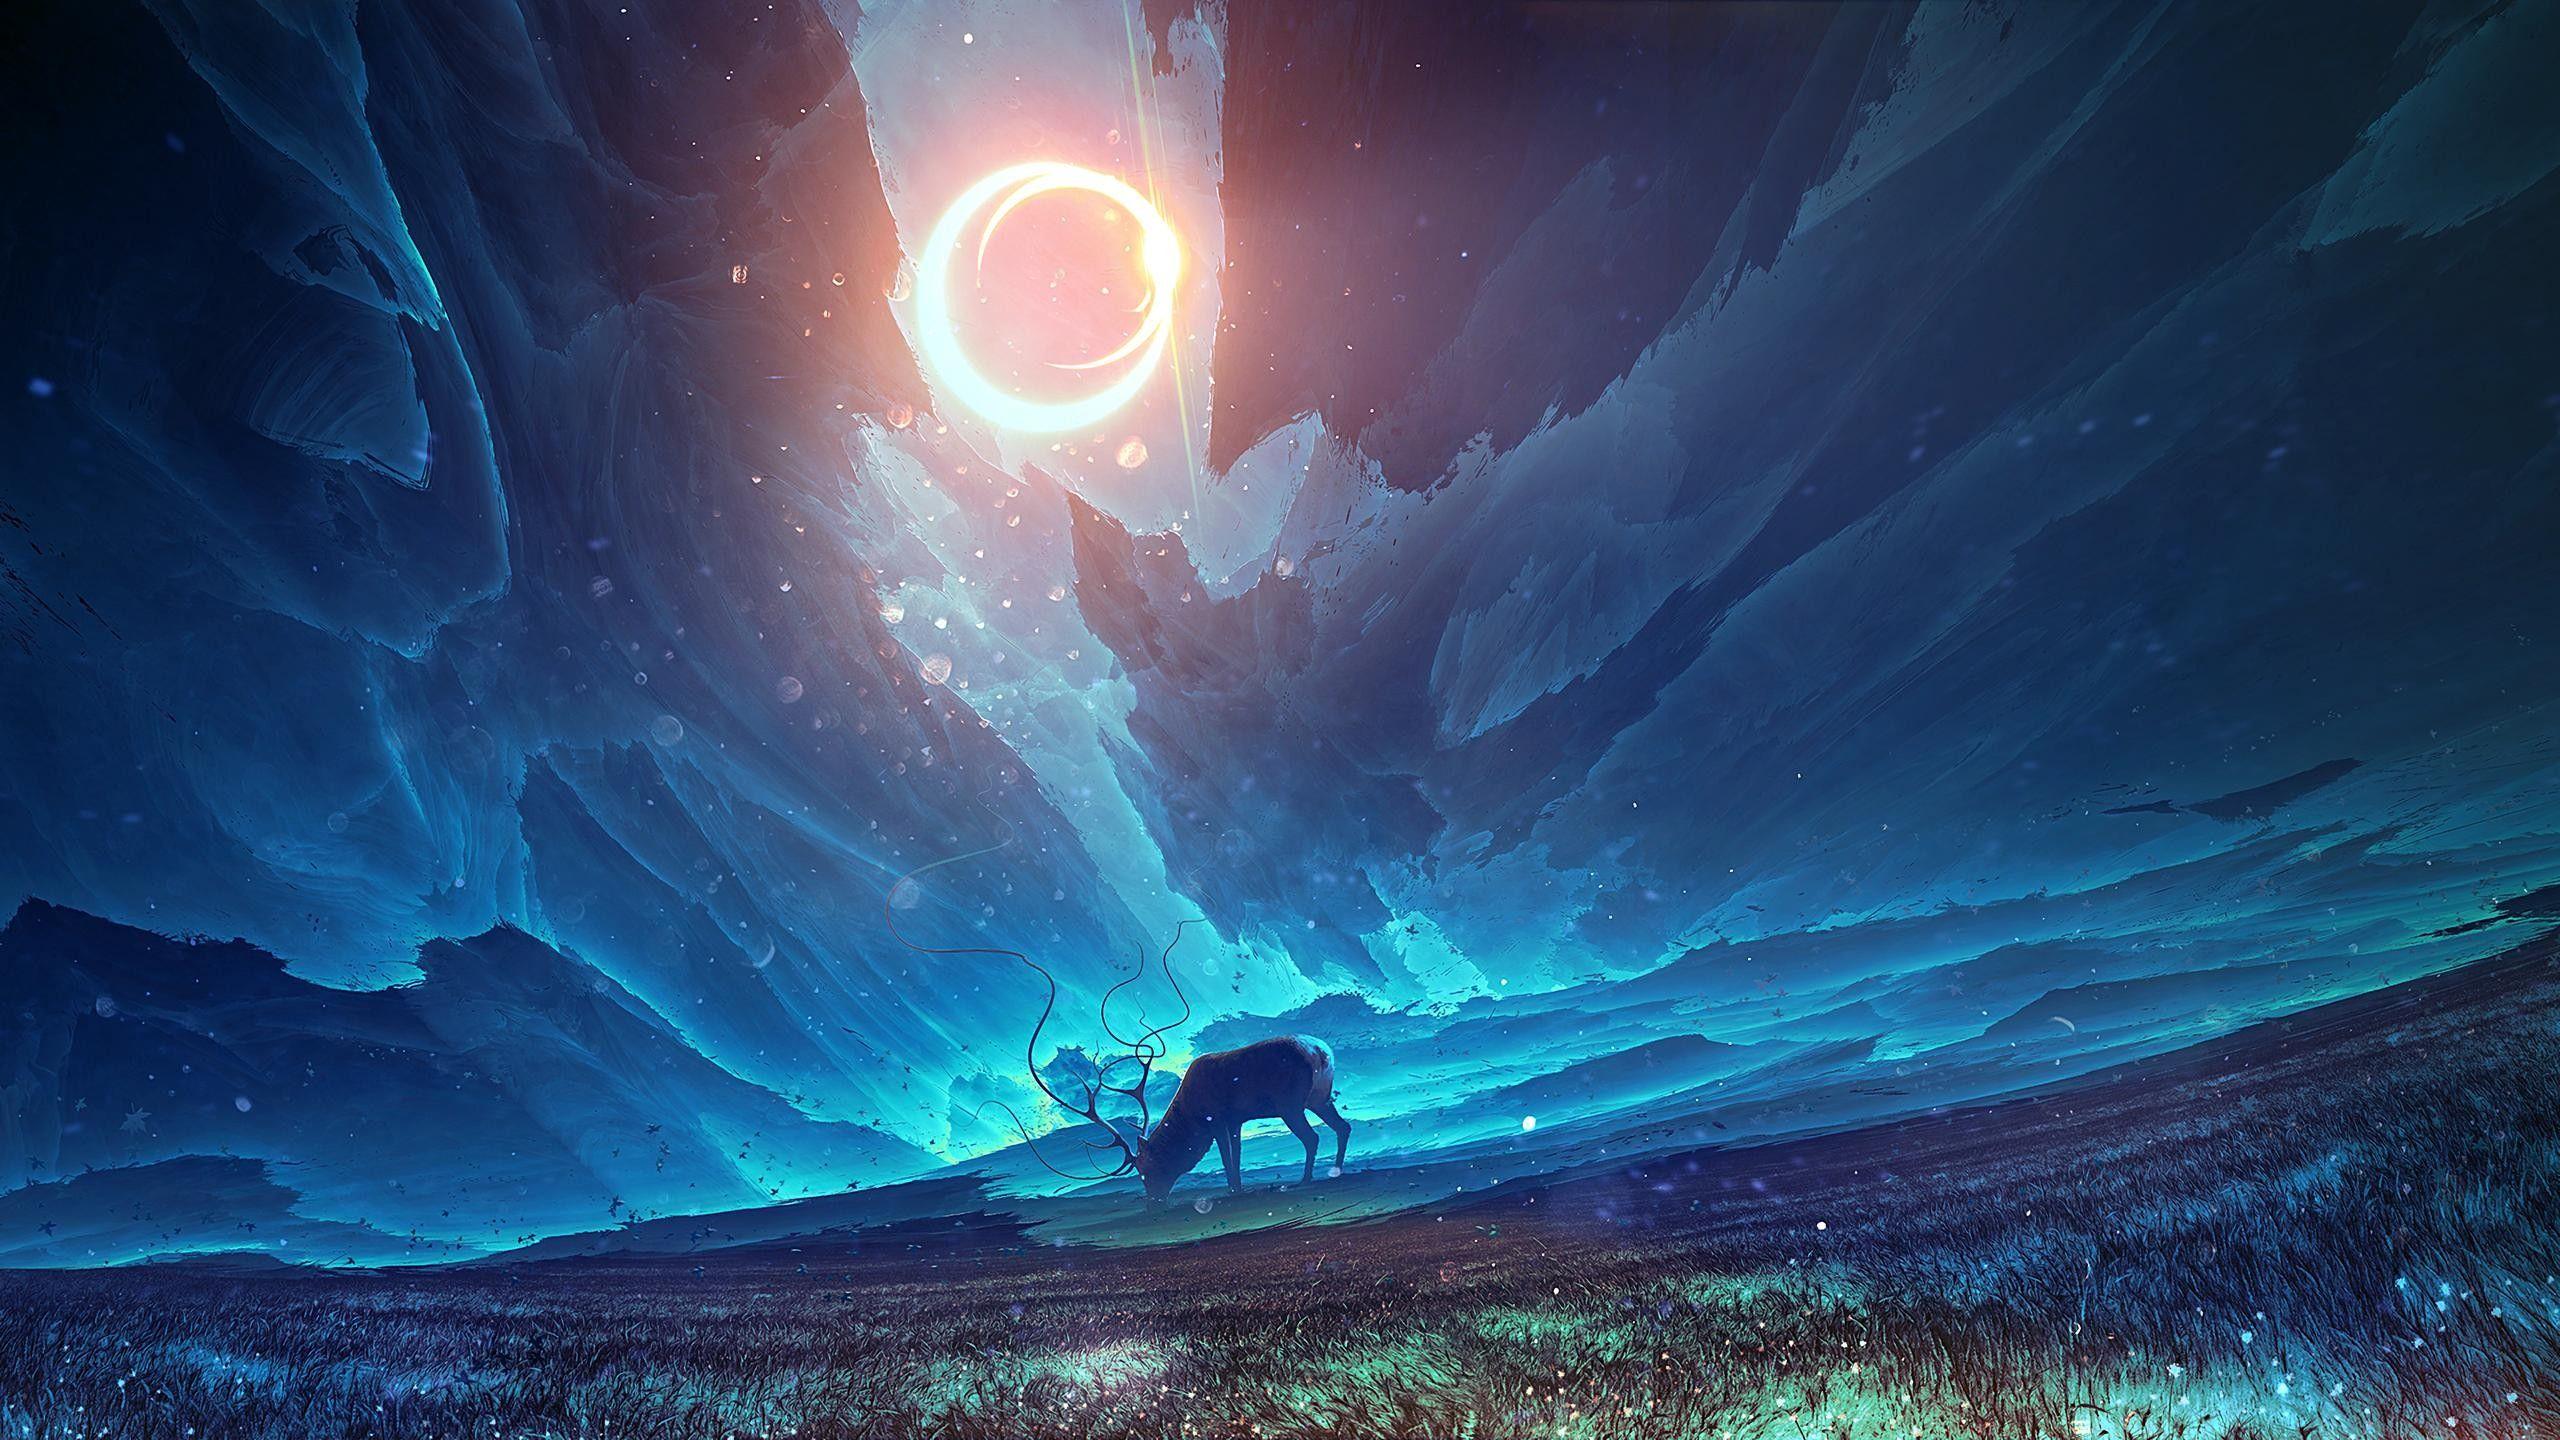 General 2560x1440 Moose Fantasy Art Fantasy Inspiration